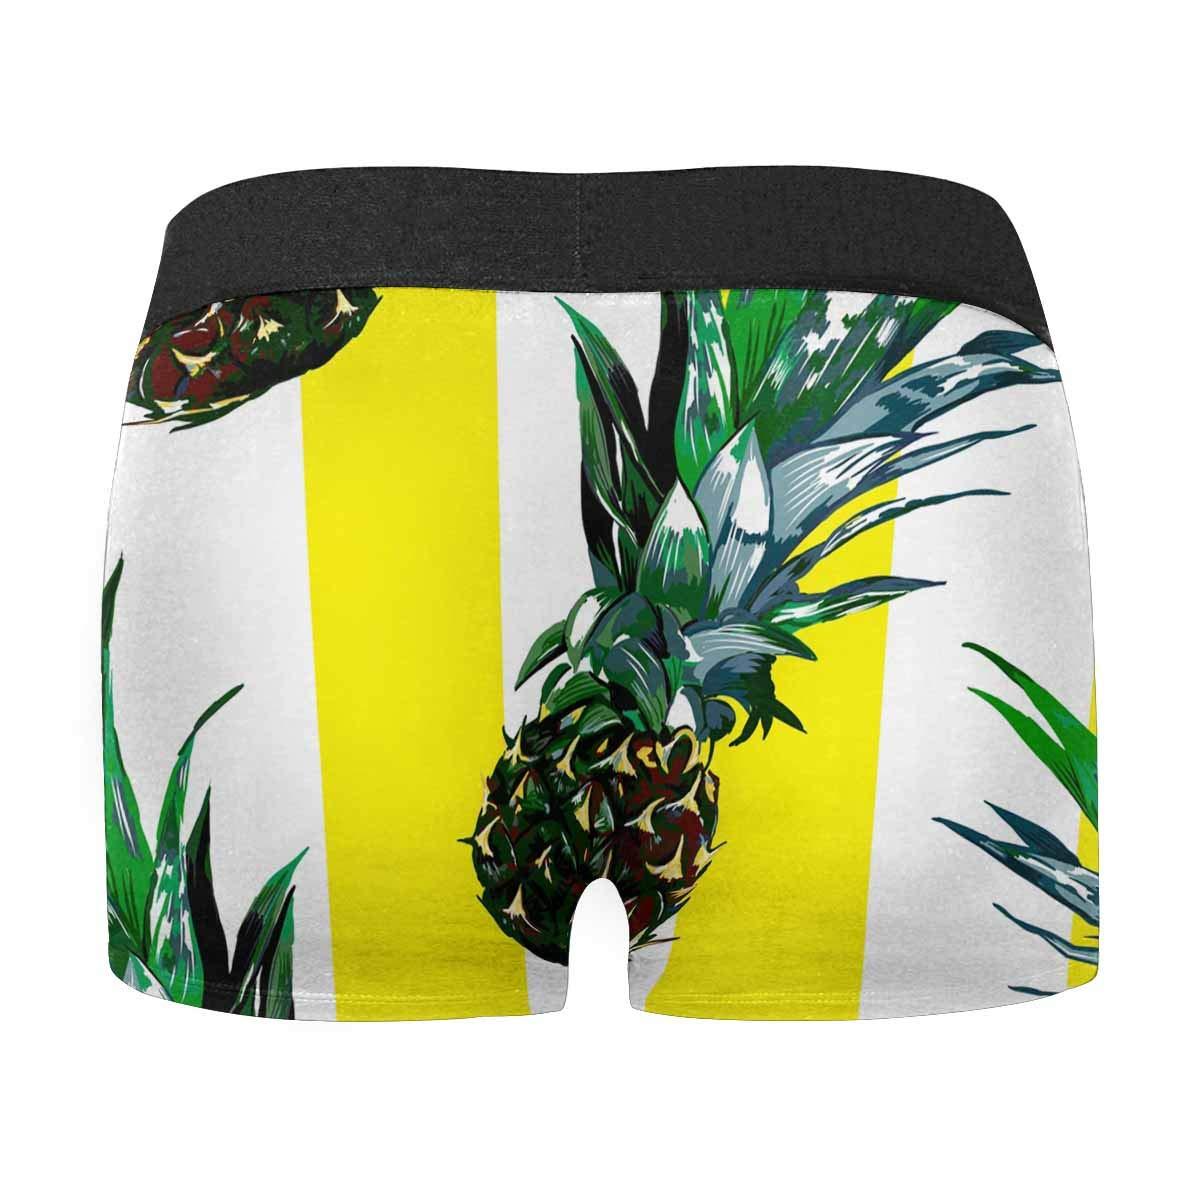 XS-3XL INTERESTPRINT Boxer Briefs Mens Underwear Pineapple Yellow White Stripes